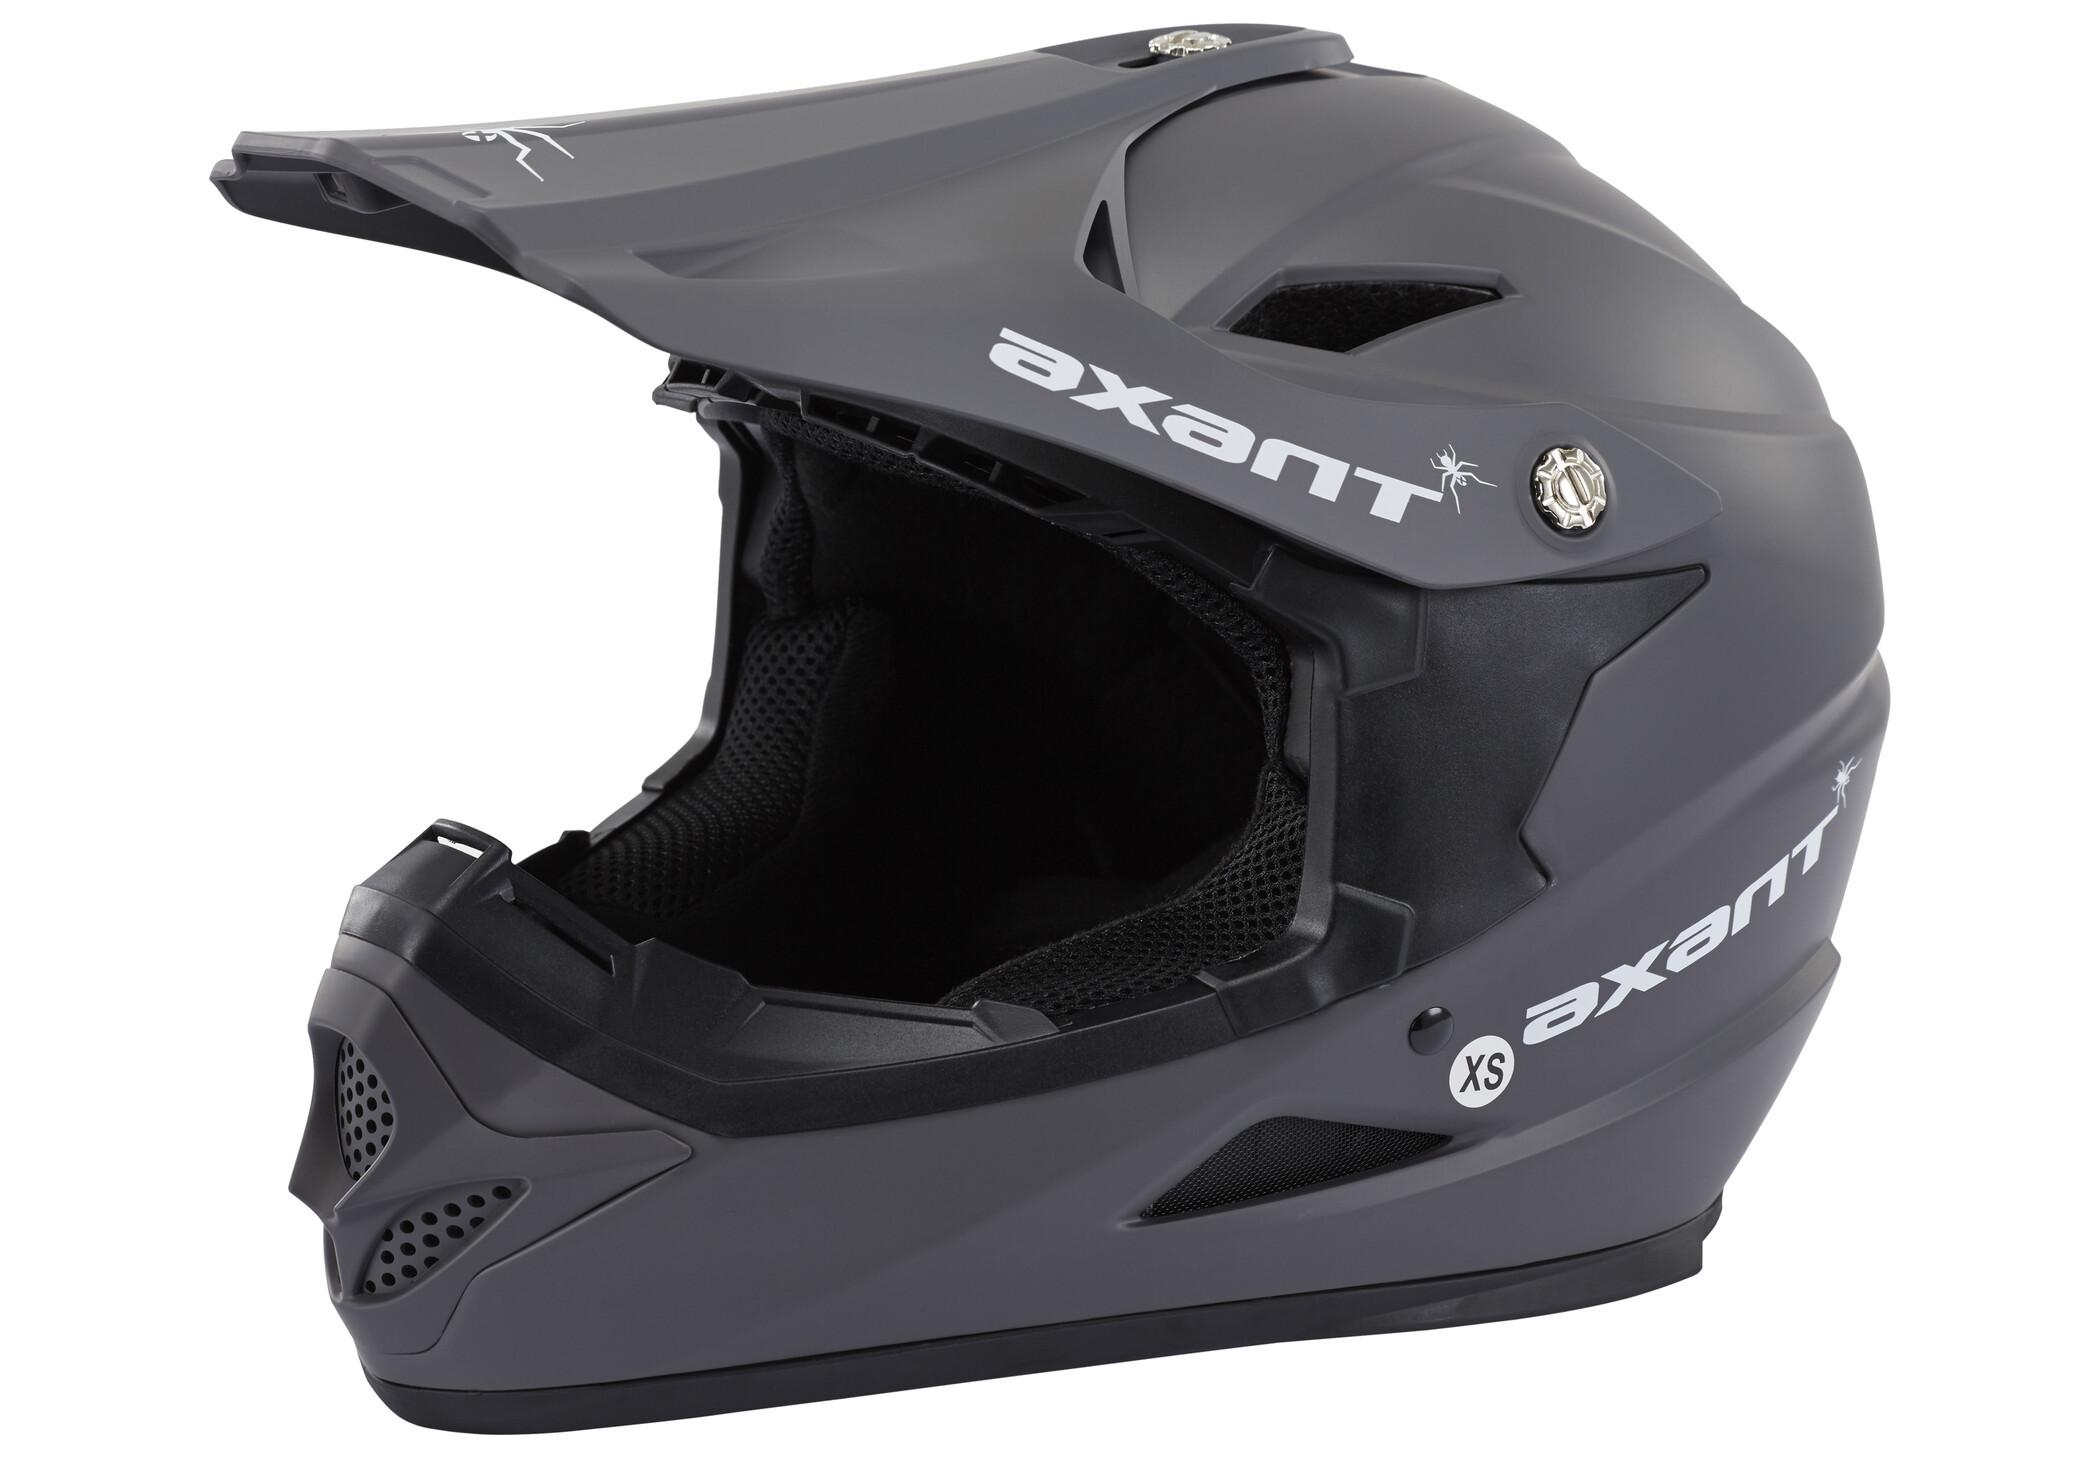 axant A-Line Comp Cykelhjelm (2019) | Helmets